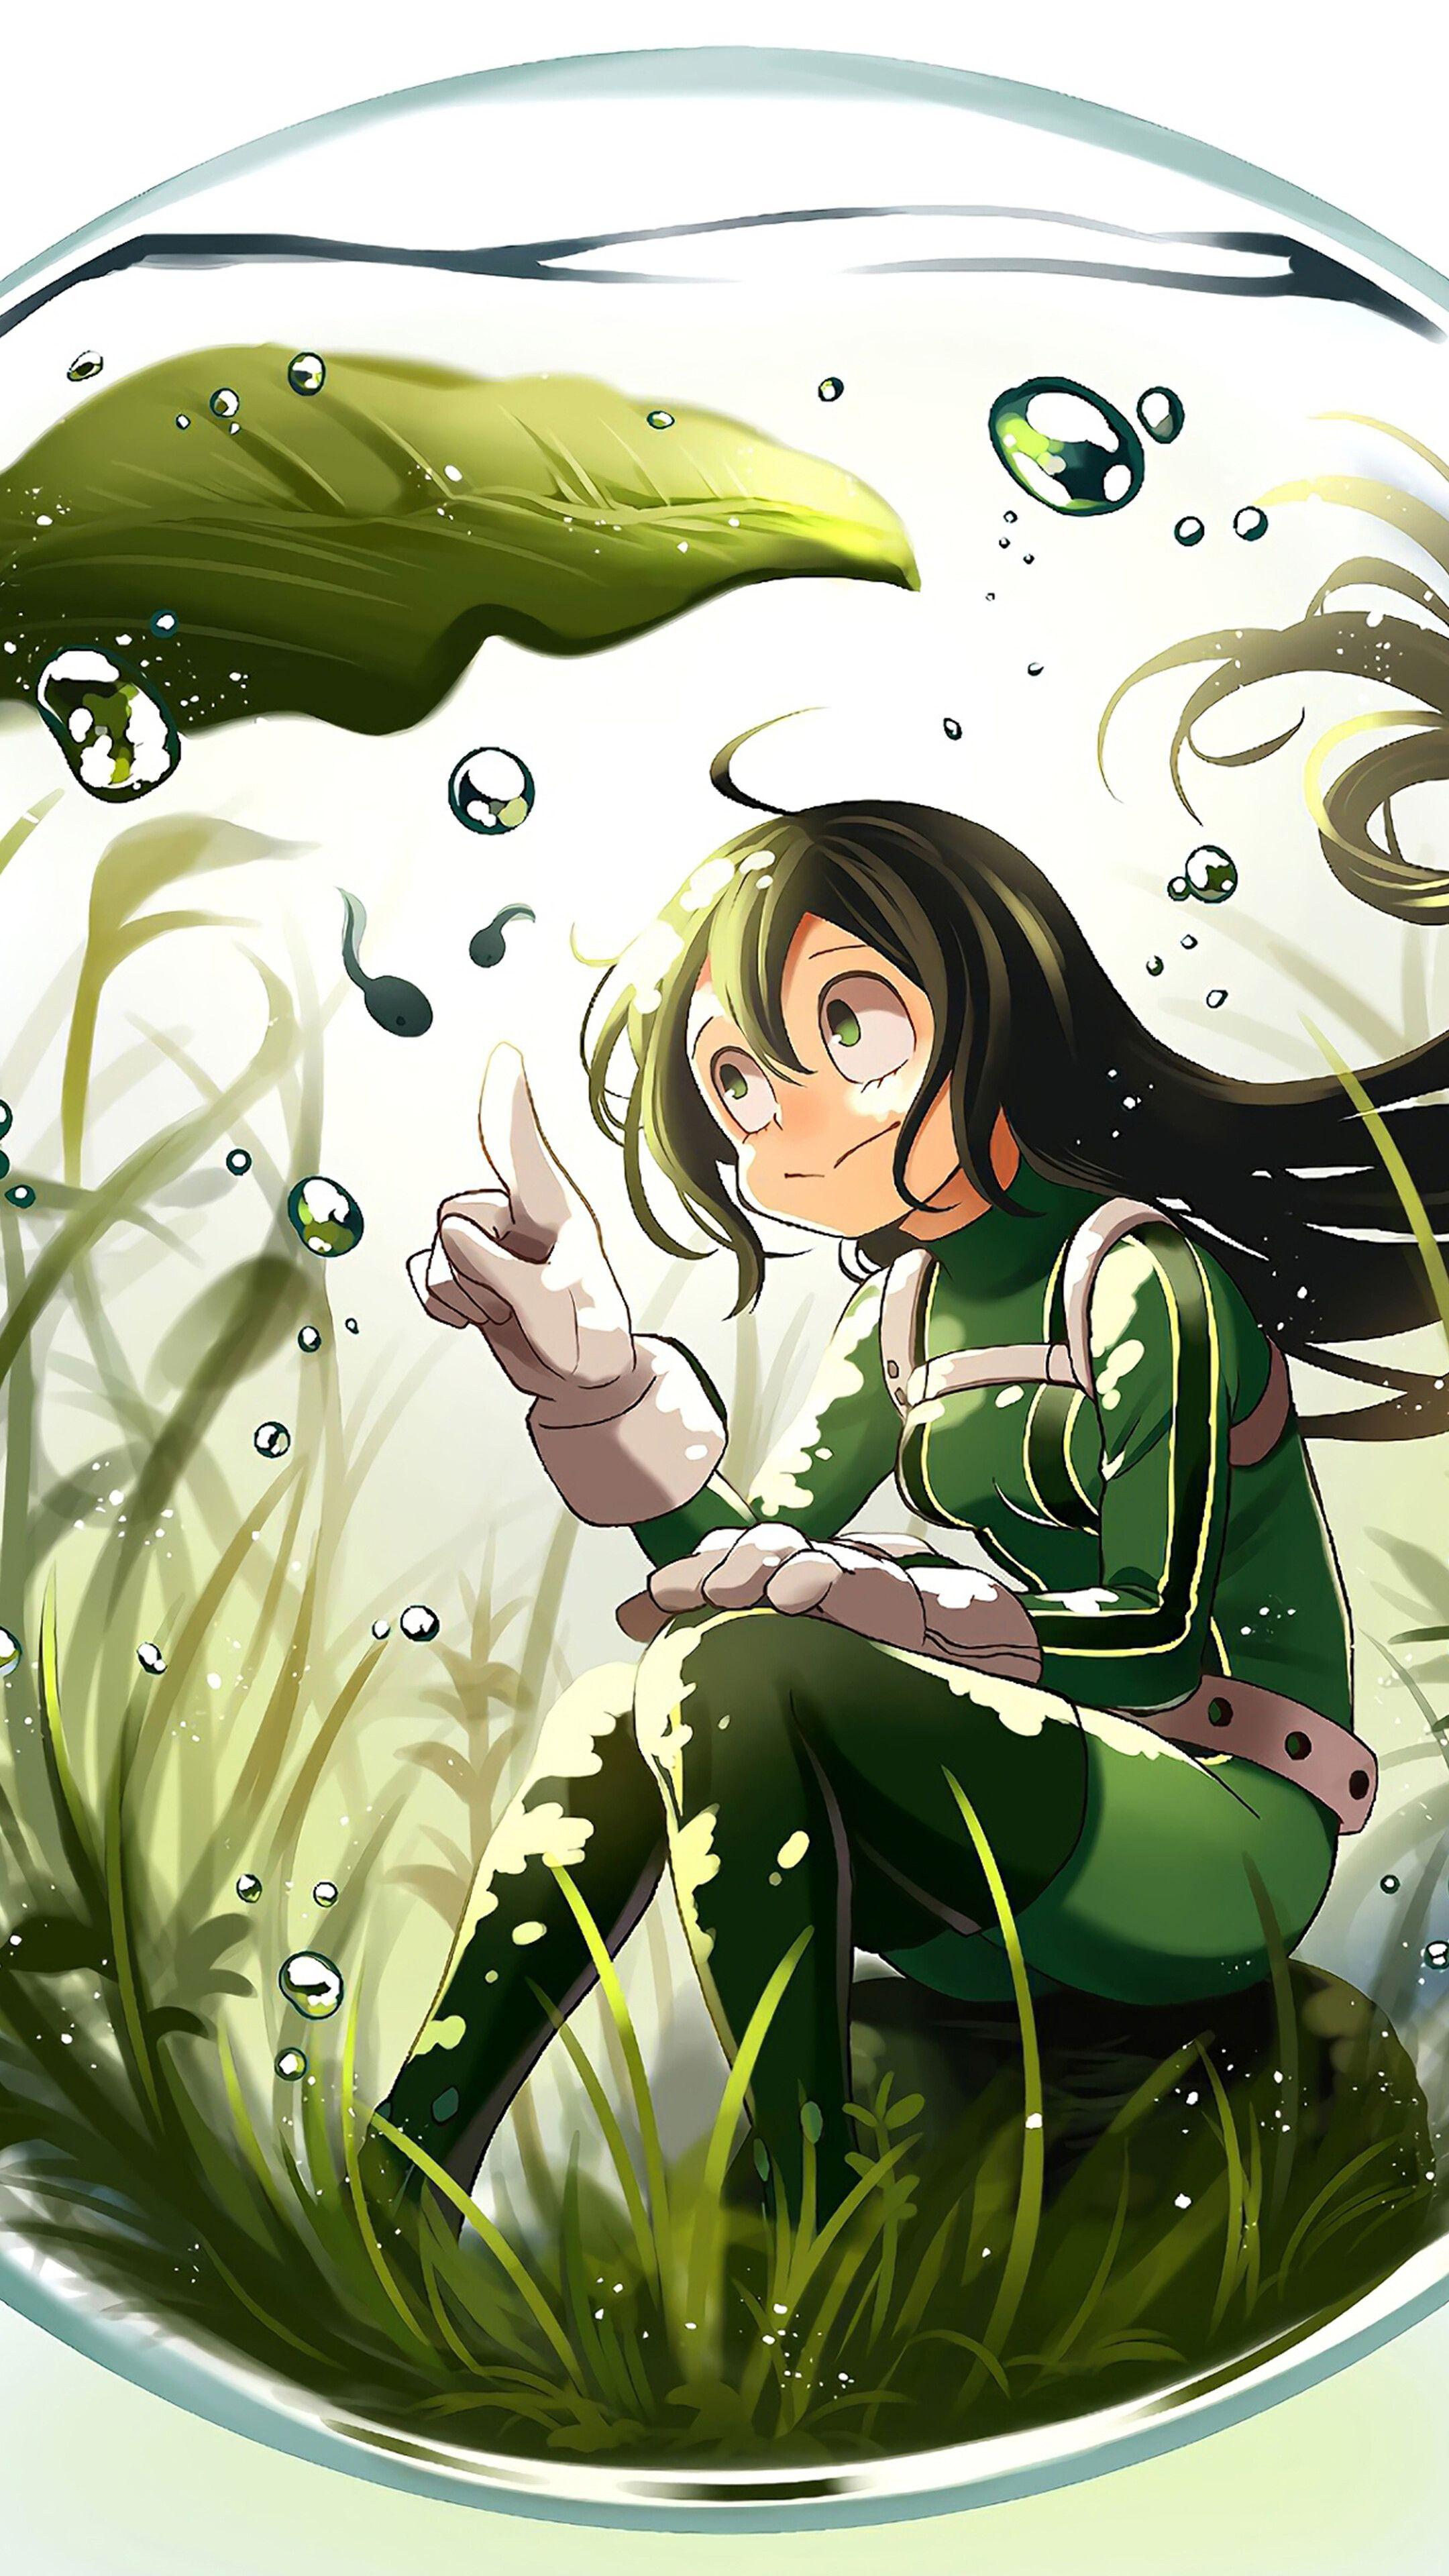 Tsuyu asui, froppy, 僕のヒーローアカデミア, my hero academia, boku no hero academia, anime 4k wallpaper. My Hero Academia Froppy Wallpapers - Wallpaper Cave